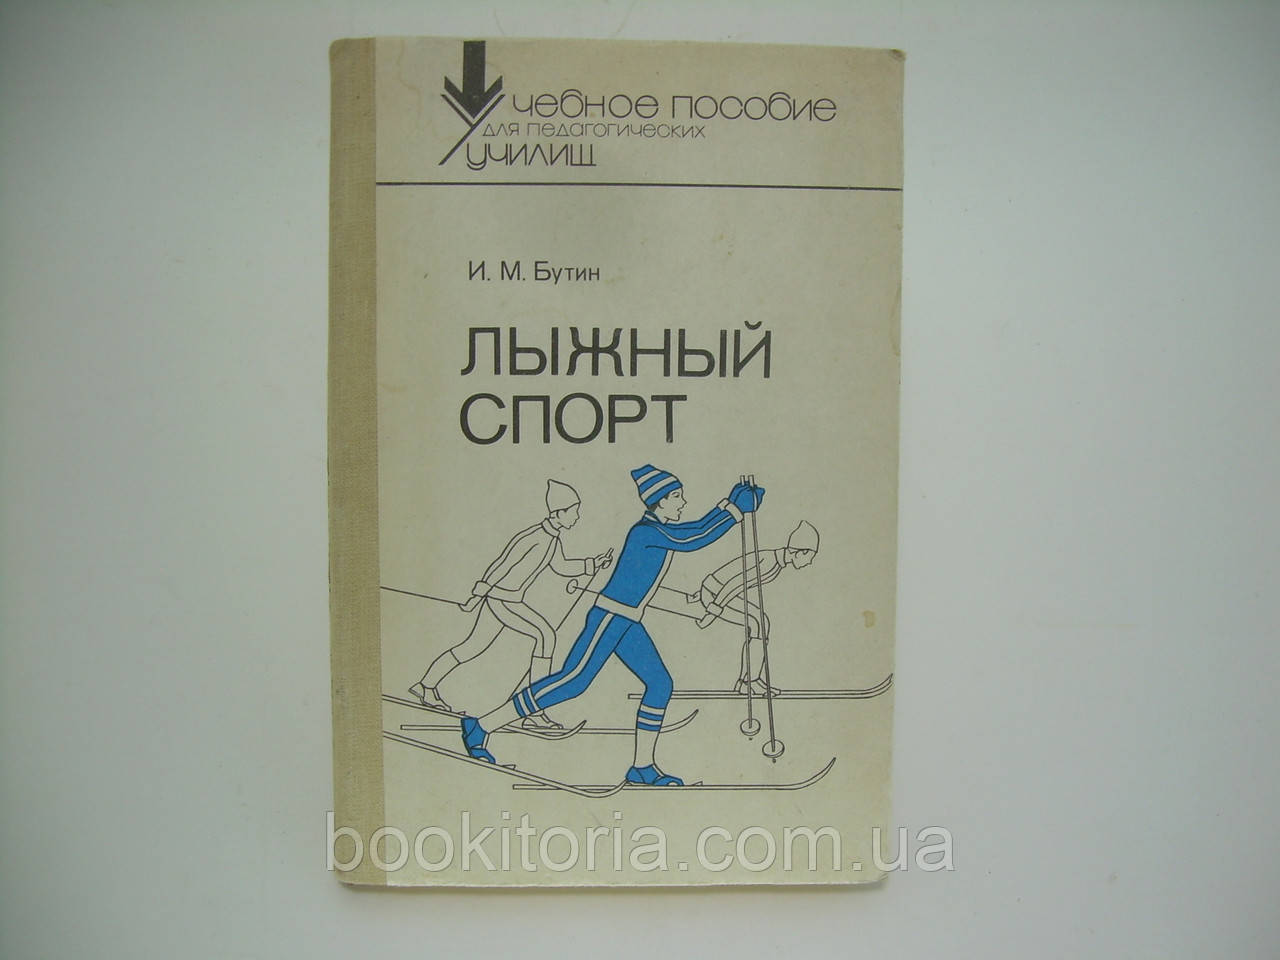 Бутин И.М. Лыжный спорт (б/у).